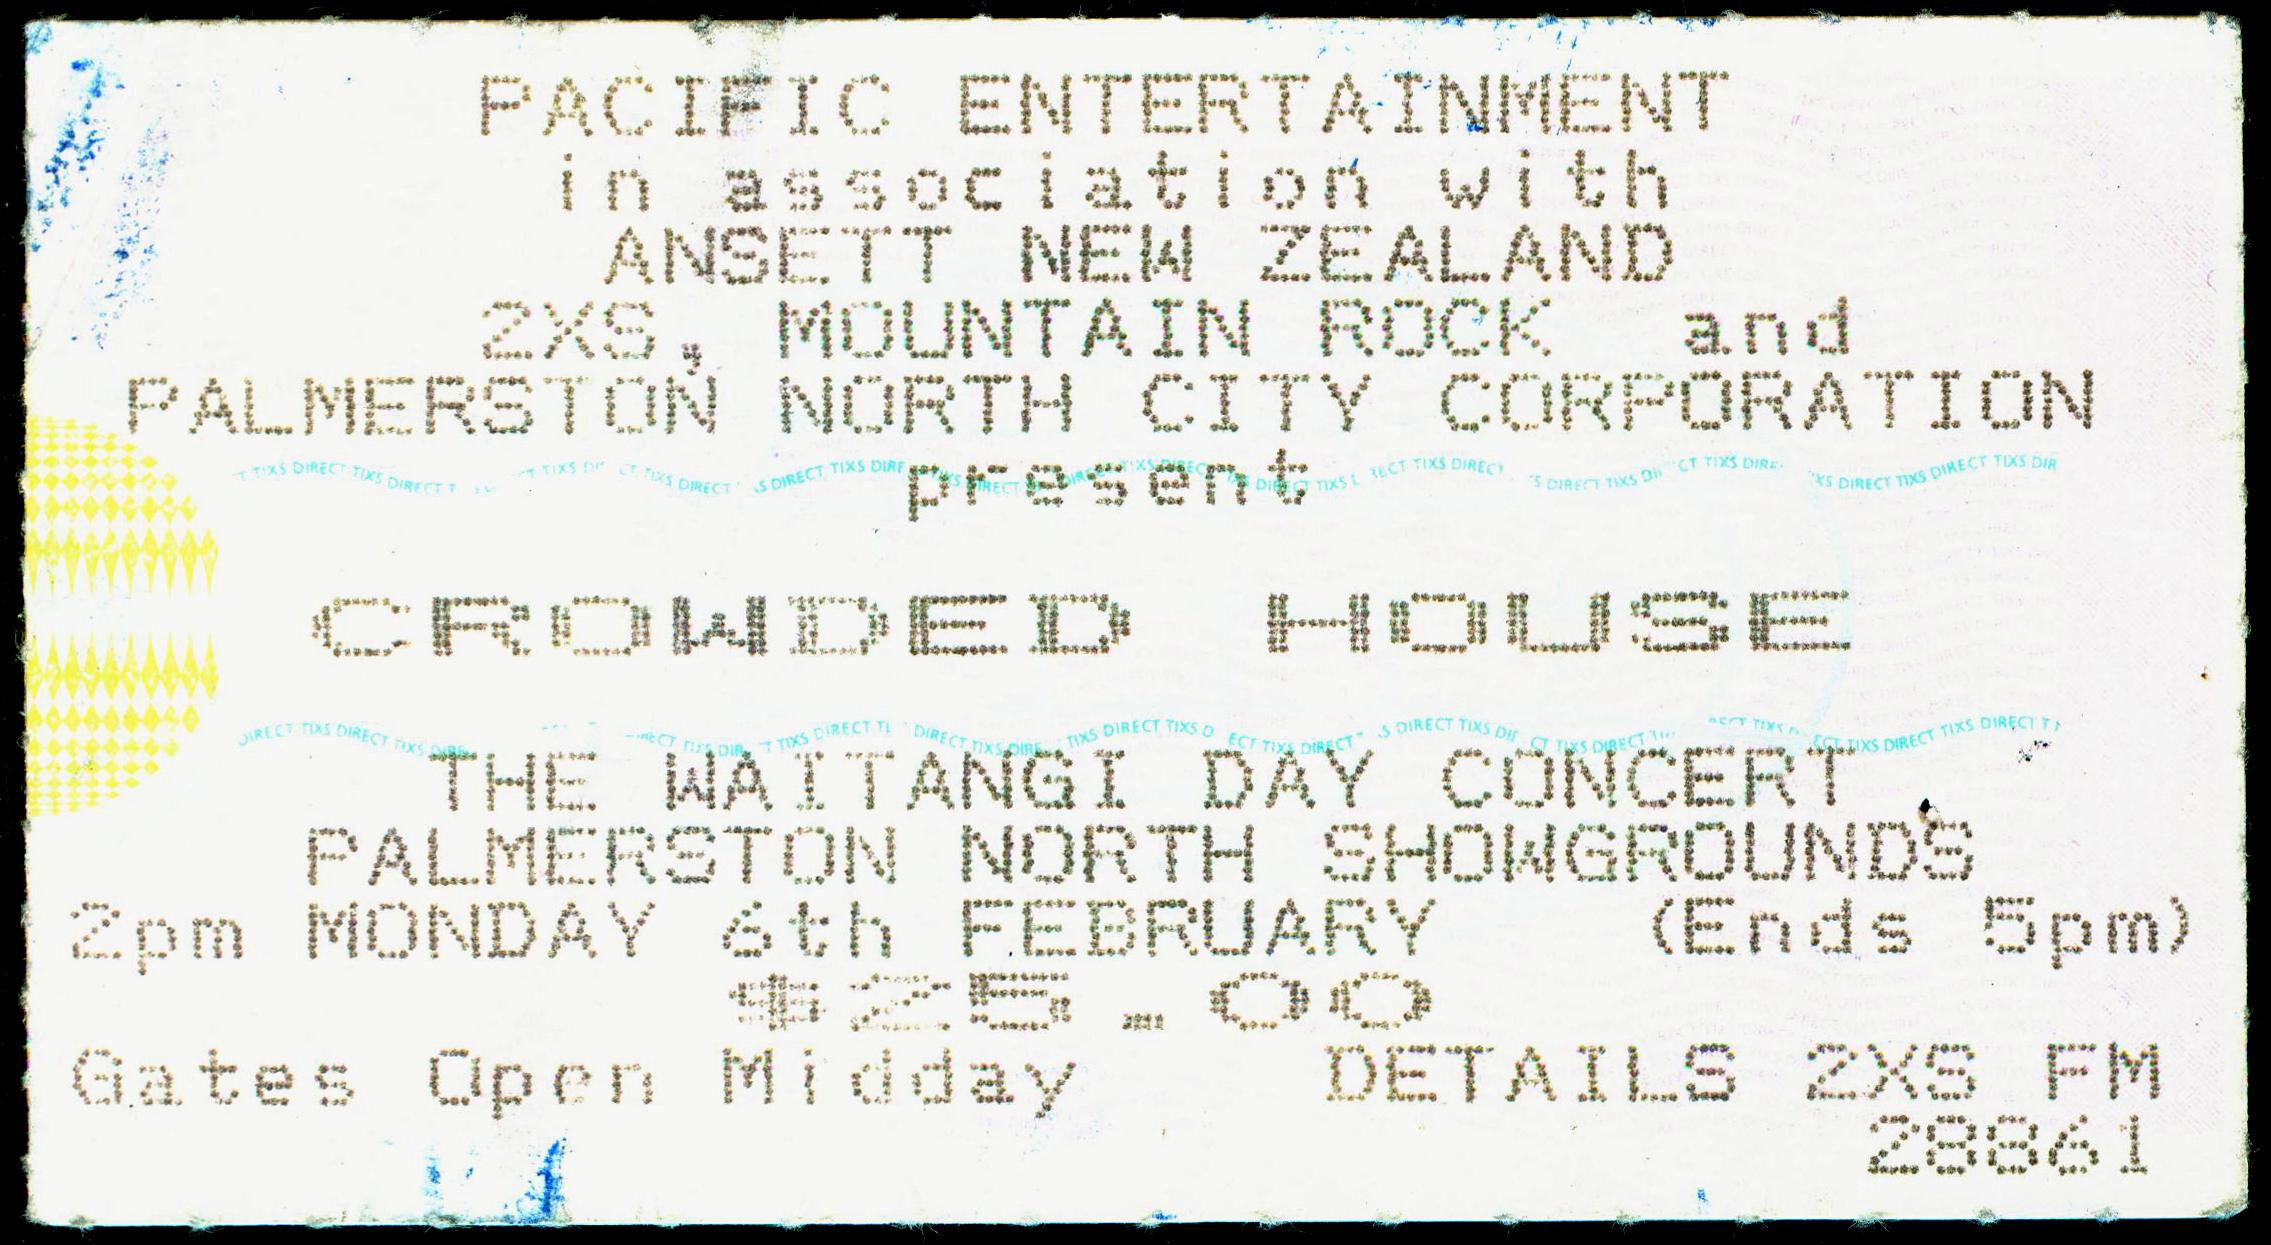 Crowded House-Palmerston North-New Zealand-6-Feb-1995-B-ticket-DC Cardwell